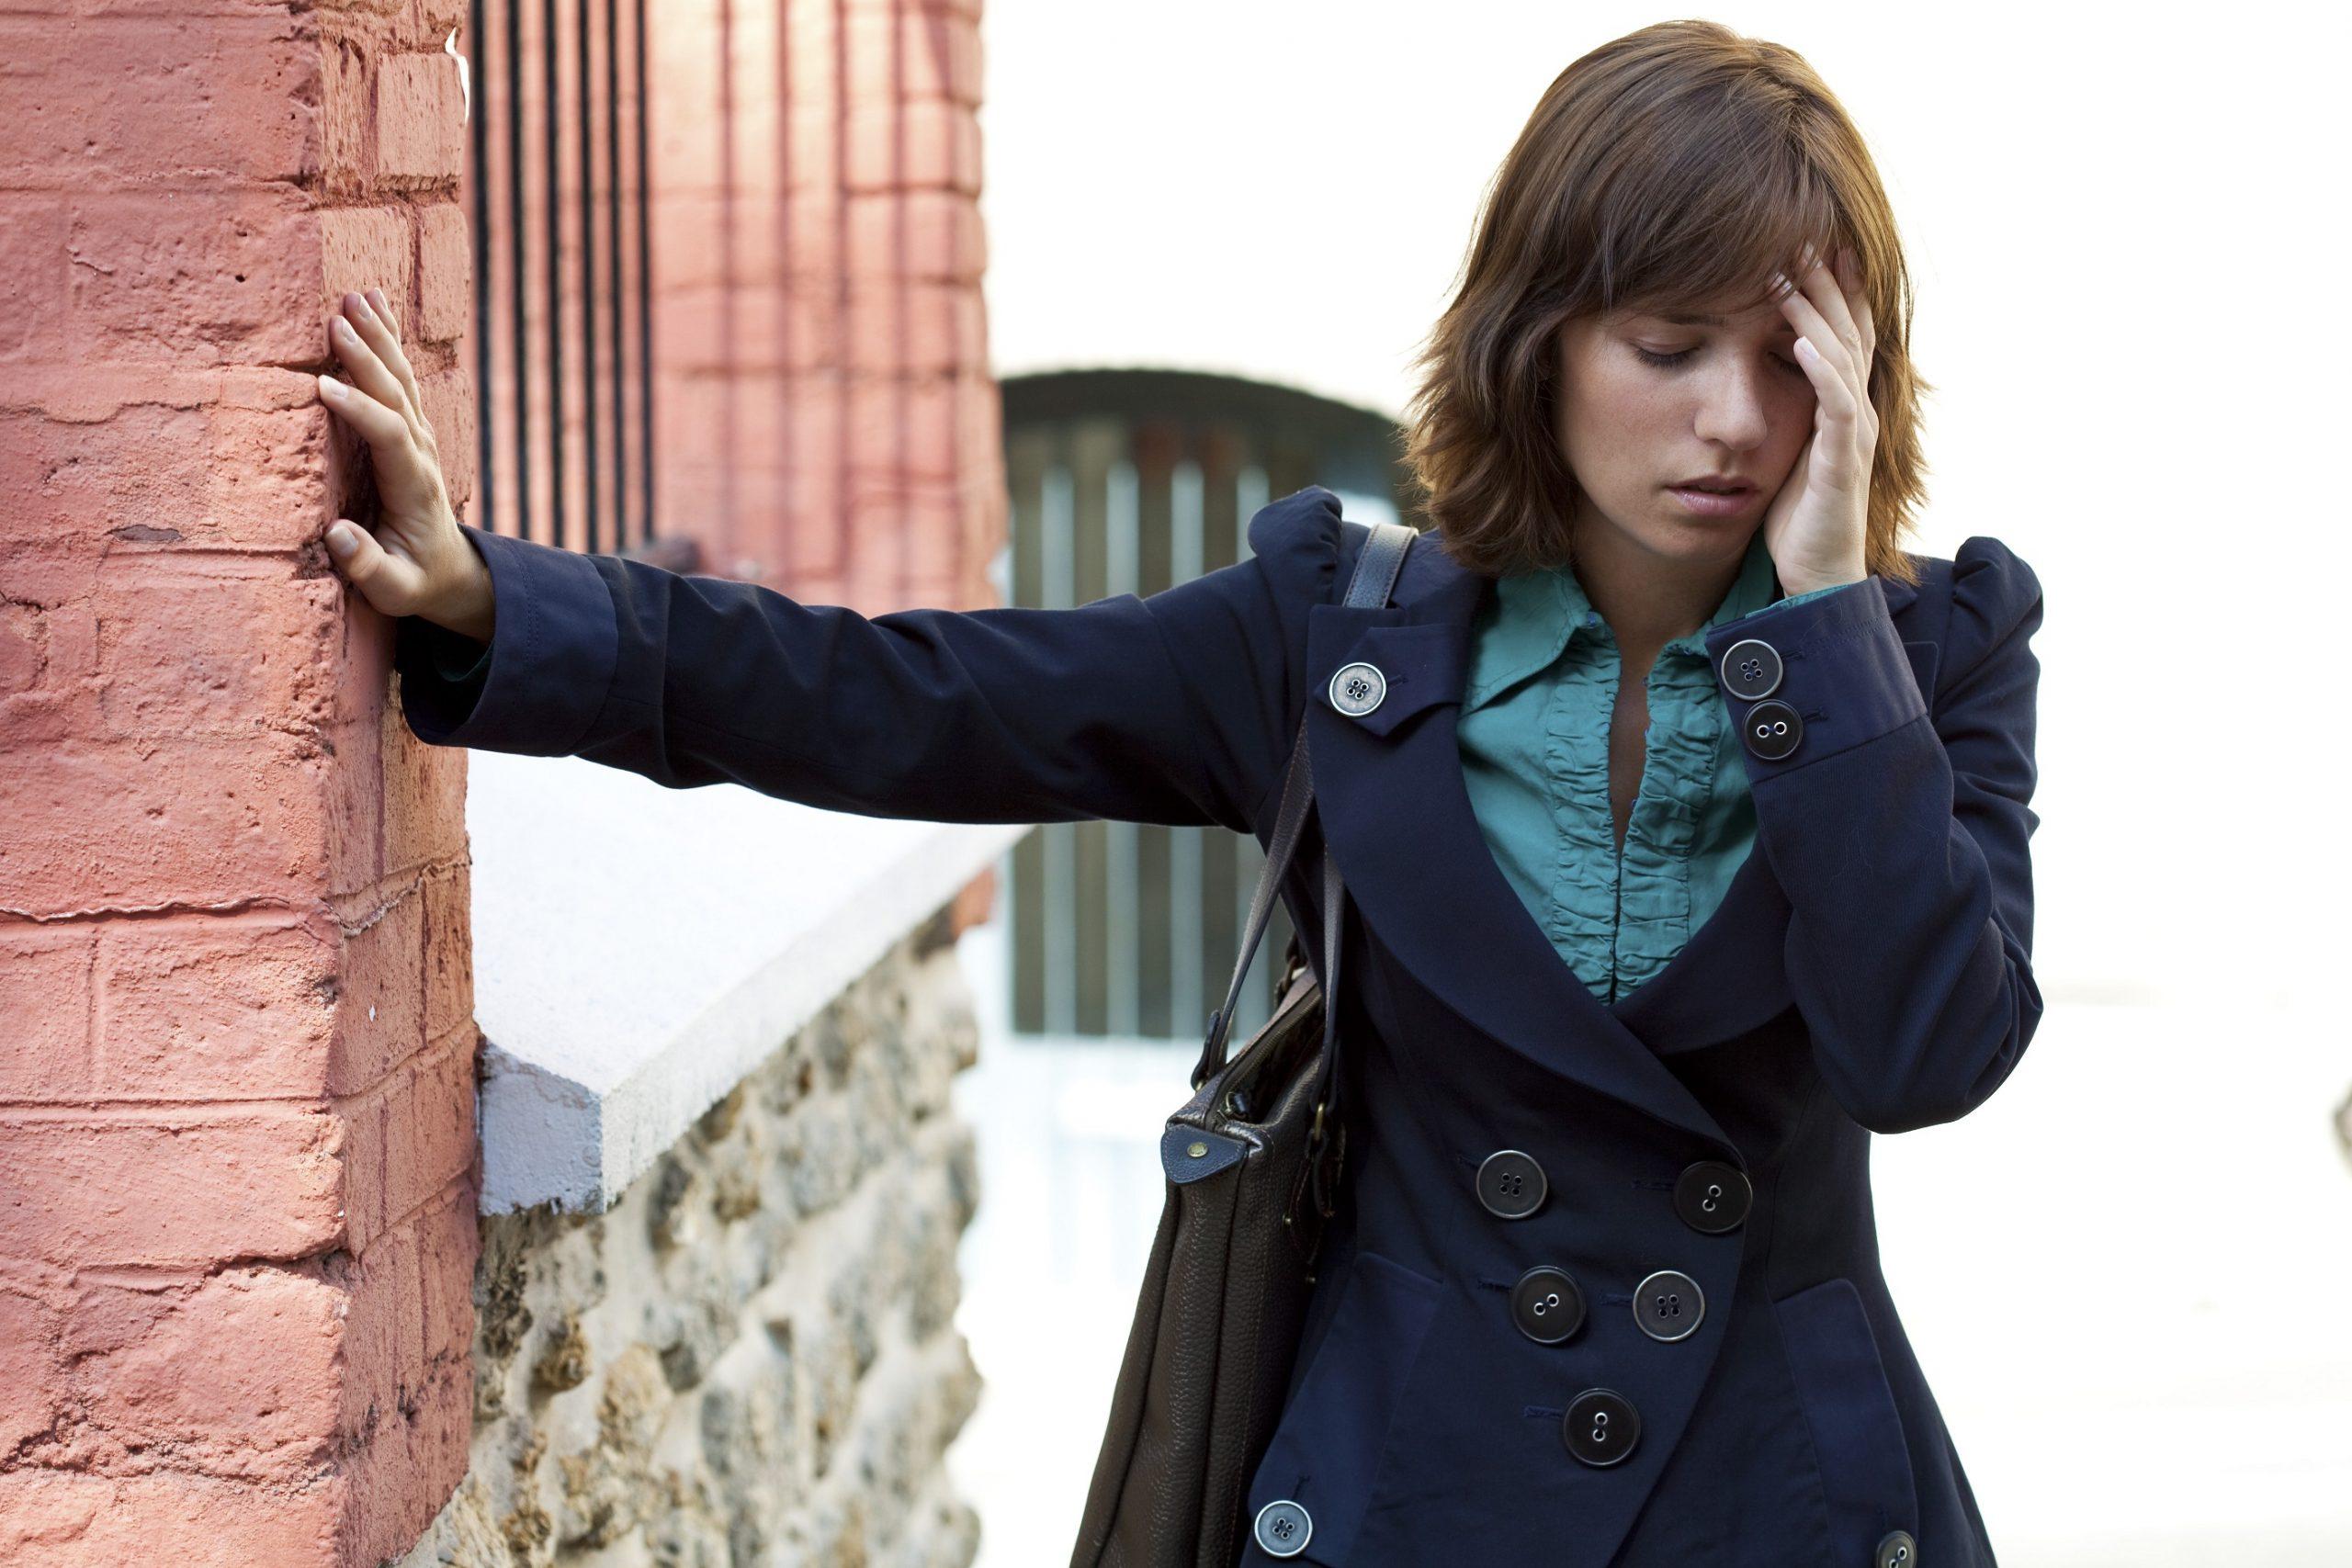 Stresul oxidativ: efecte nocive